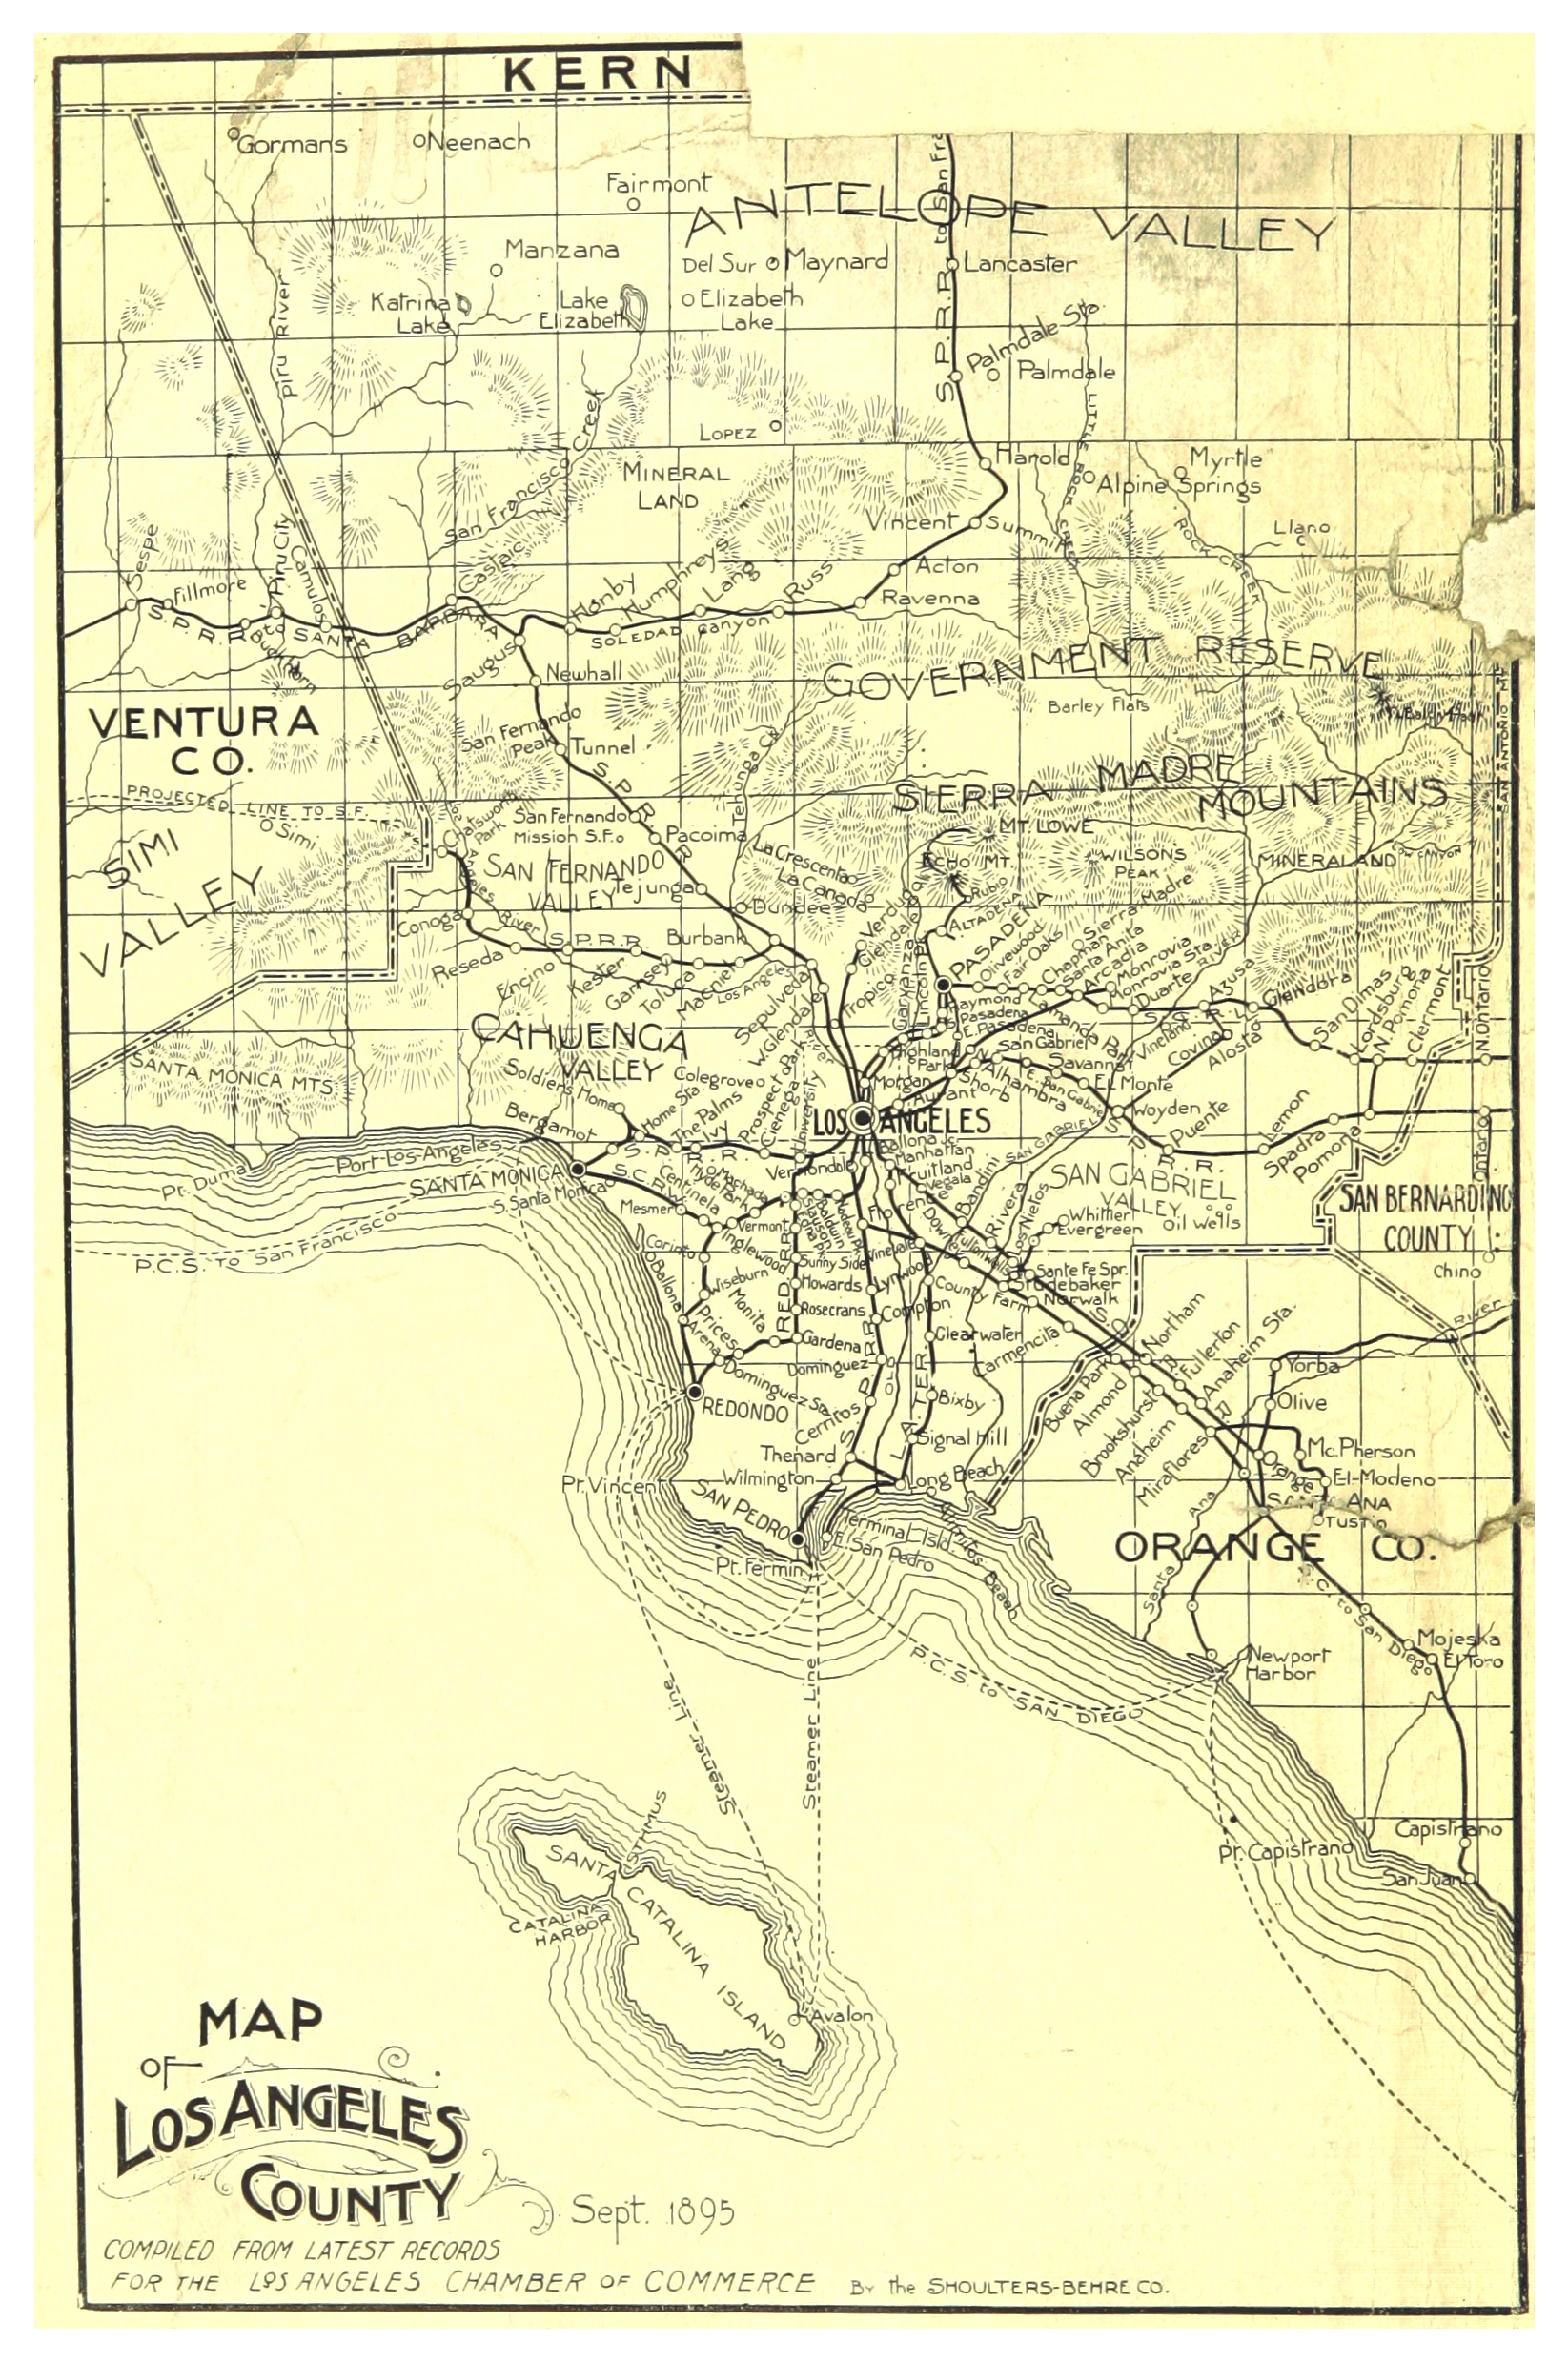 File:MAP OF LOS ANGELES COUNTY (1895).jpg - Wikimedia Commons on map of illinois, map of santa clara county, map of long beach, map of la, long beach, southern california, map of alameda county, riverside county, ventura county, map of california county, map in los angeles, san diego county, map of san bernardino county, map of ventura, map of lax area, map of santa monica, map of san fernando valley, downtown los angeles, united states of america, map of kern county, cities in san bernardino county, san bernardino county, orange county, santa monica, map of santa clarita, map of san bernardino area, beverly hills, santa clarita, map of monrovia, map of valencia,